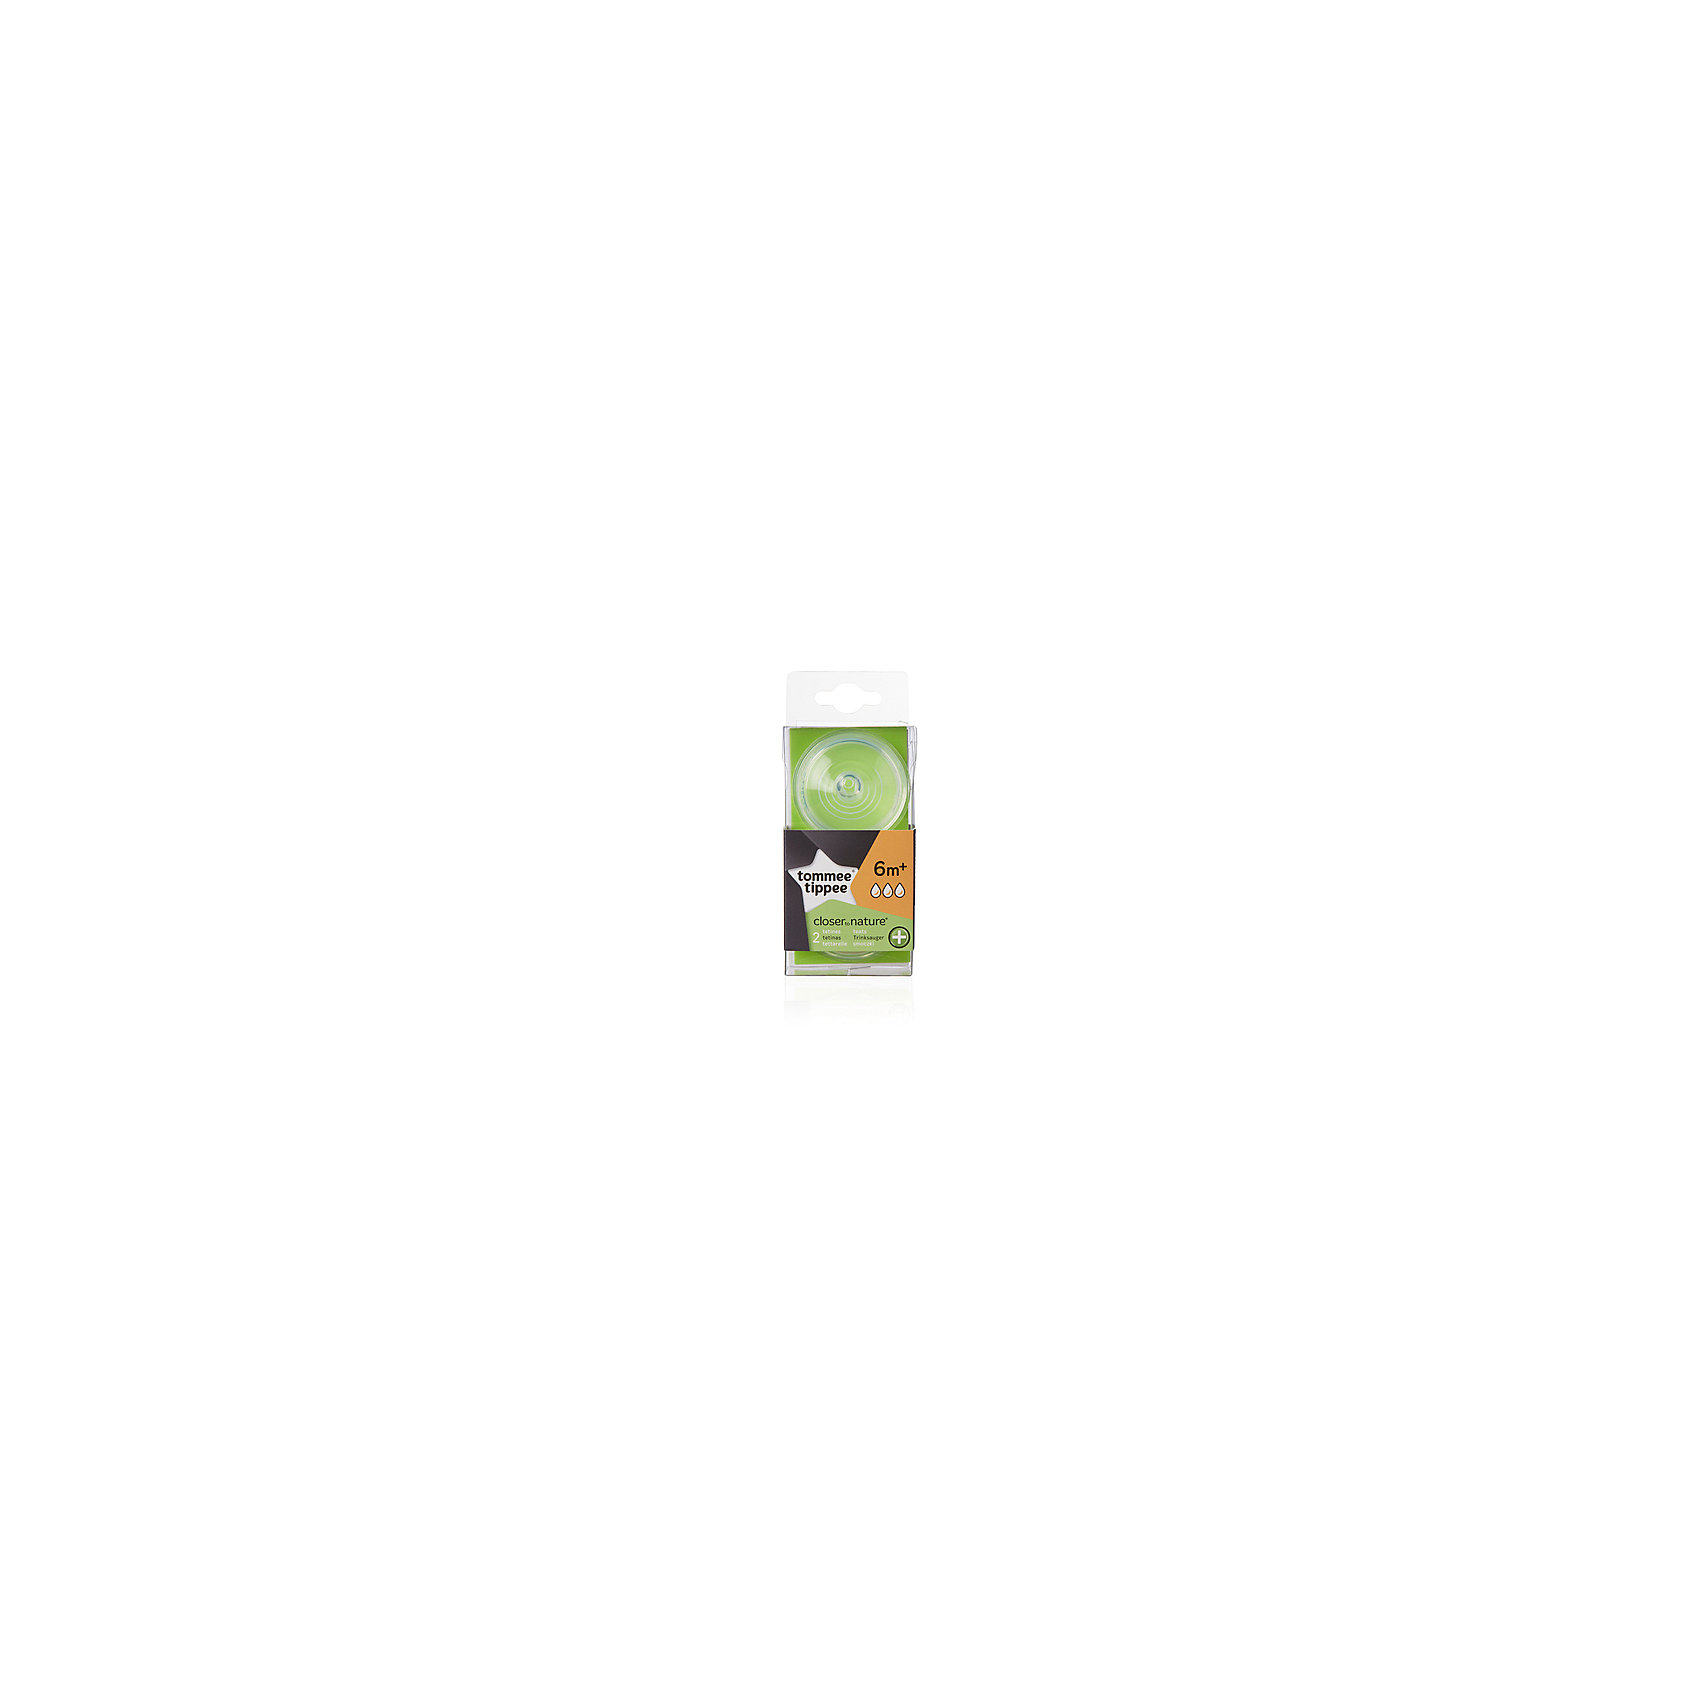 Cоски для антиколиковой бутылочки Tommee Tippee Close to nature, с 6 мес., быстрый поток, 2 шт.